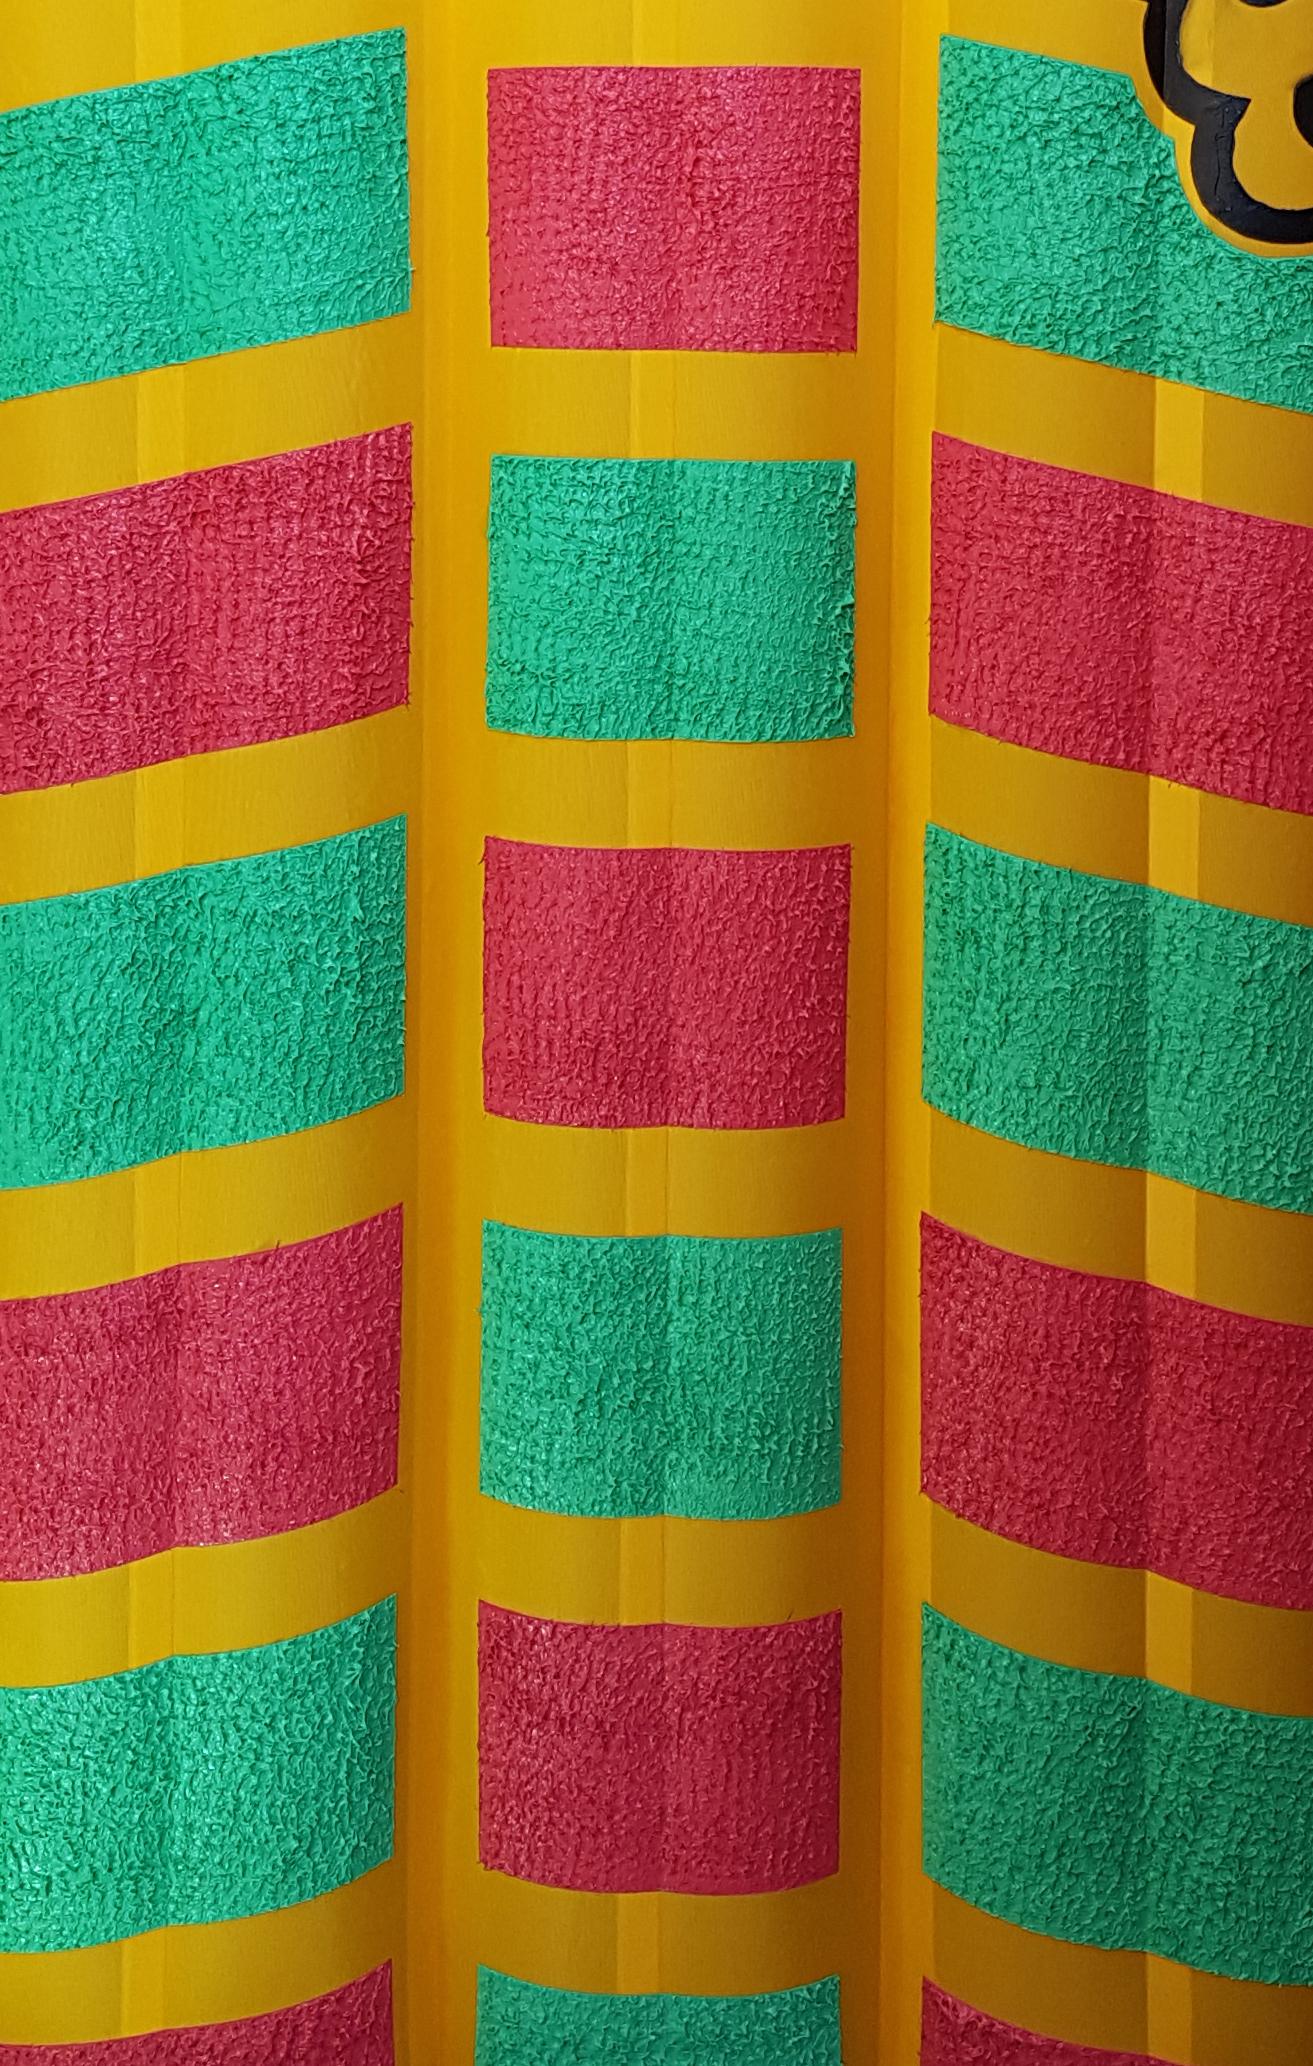 COLOURED grip:  £15 GBP per colour